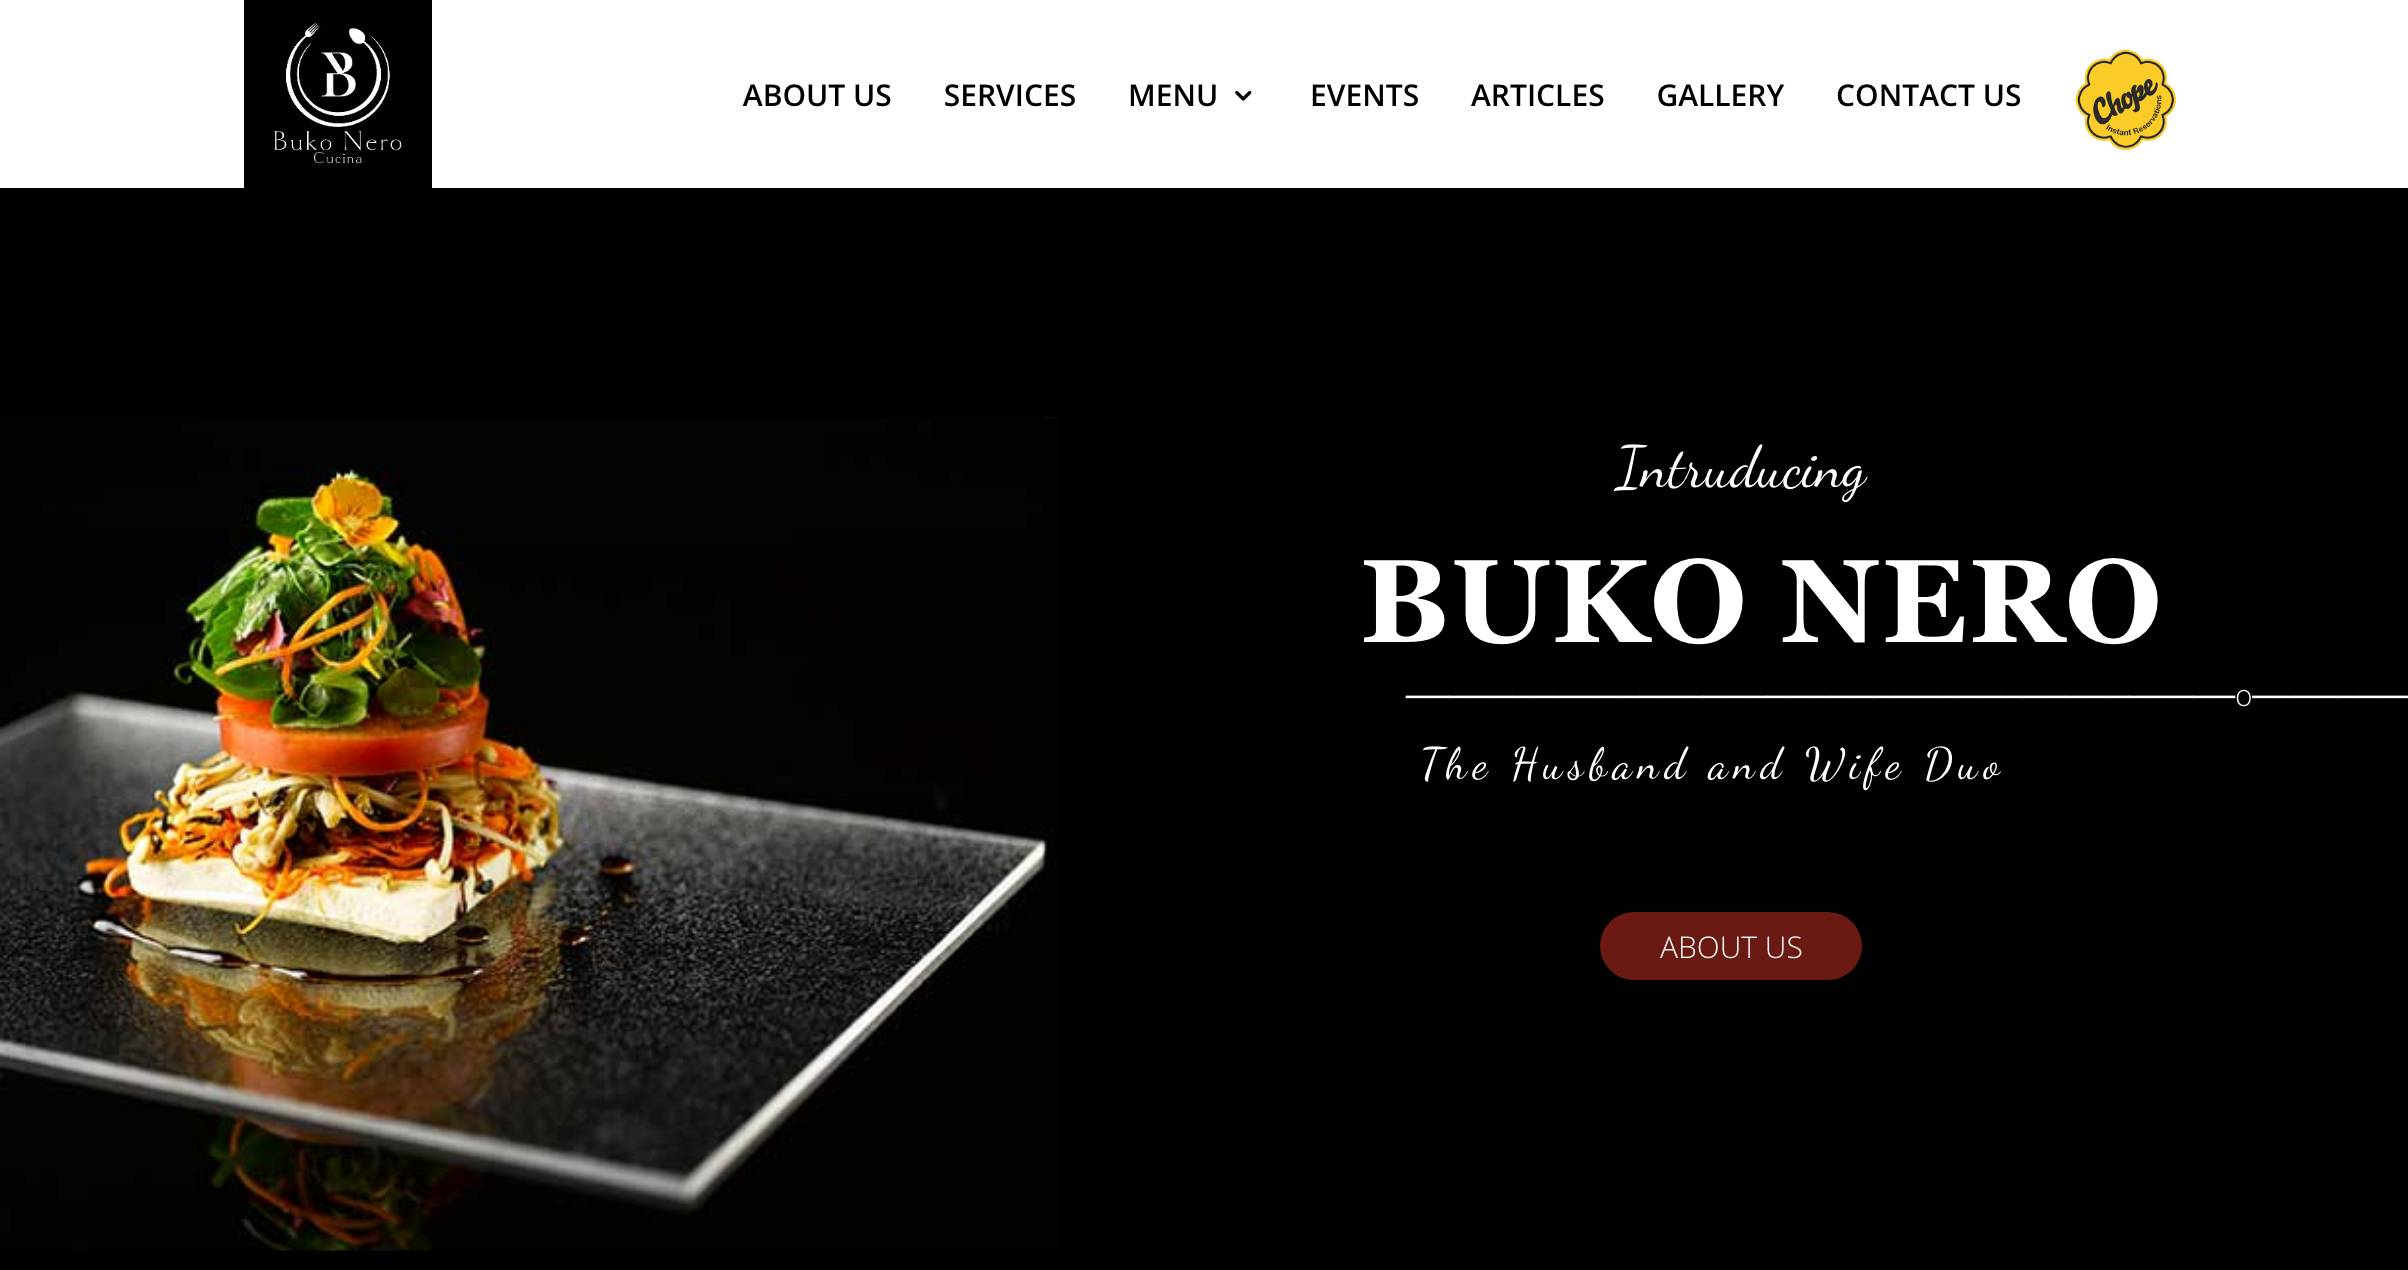 Italian Restaurant Singapore - Buko Nero